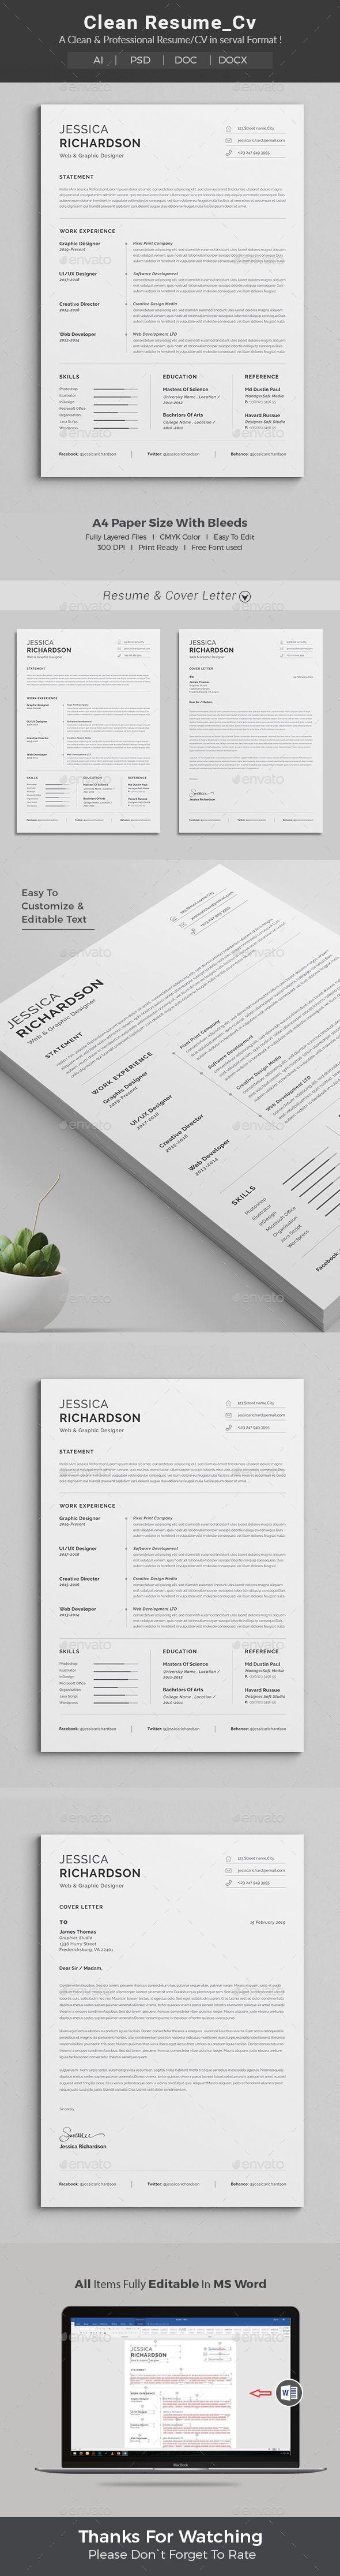 Resume Template PSD, AI, DOCX & DOC #Coverletters | Resume Ideas ...